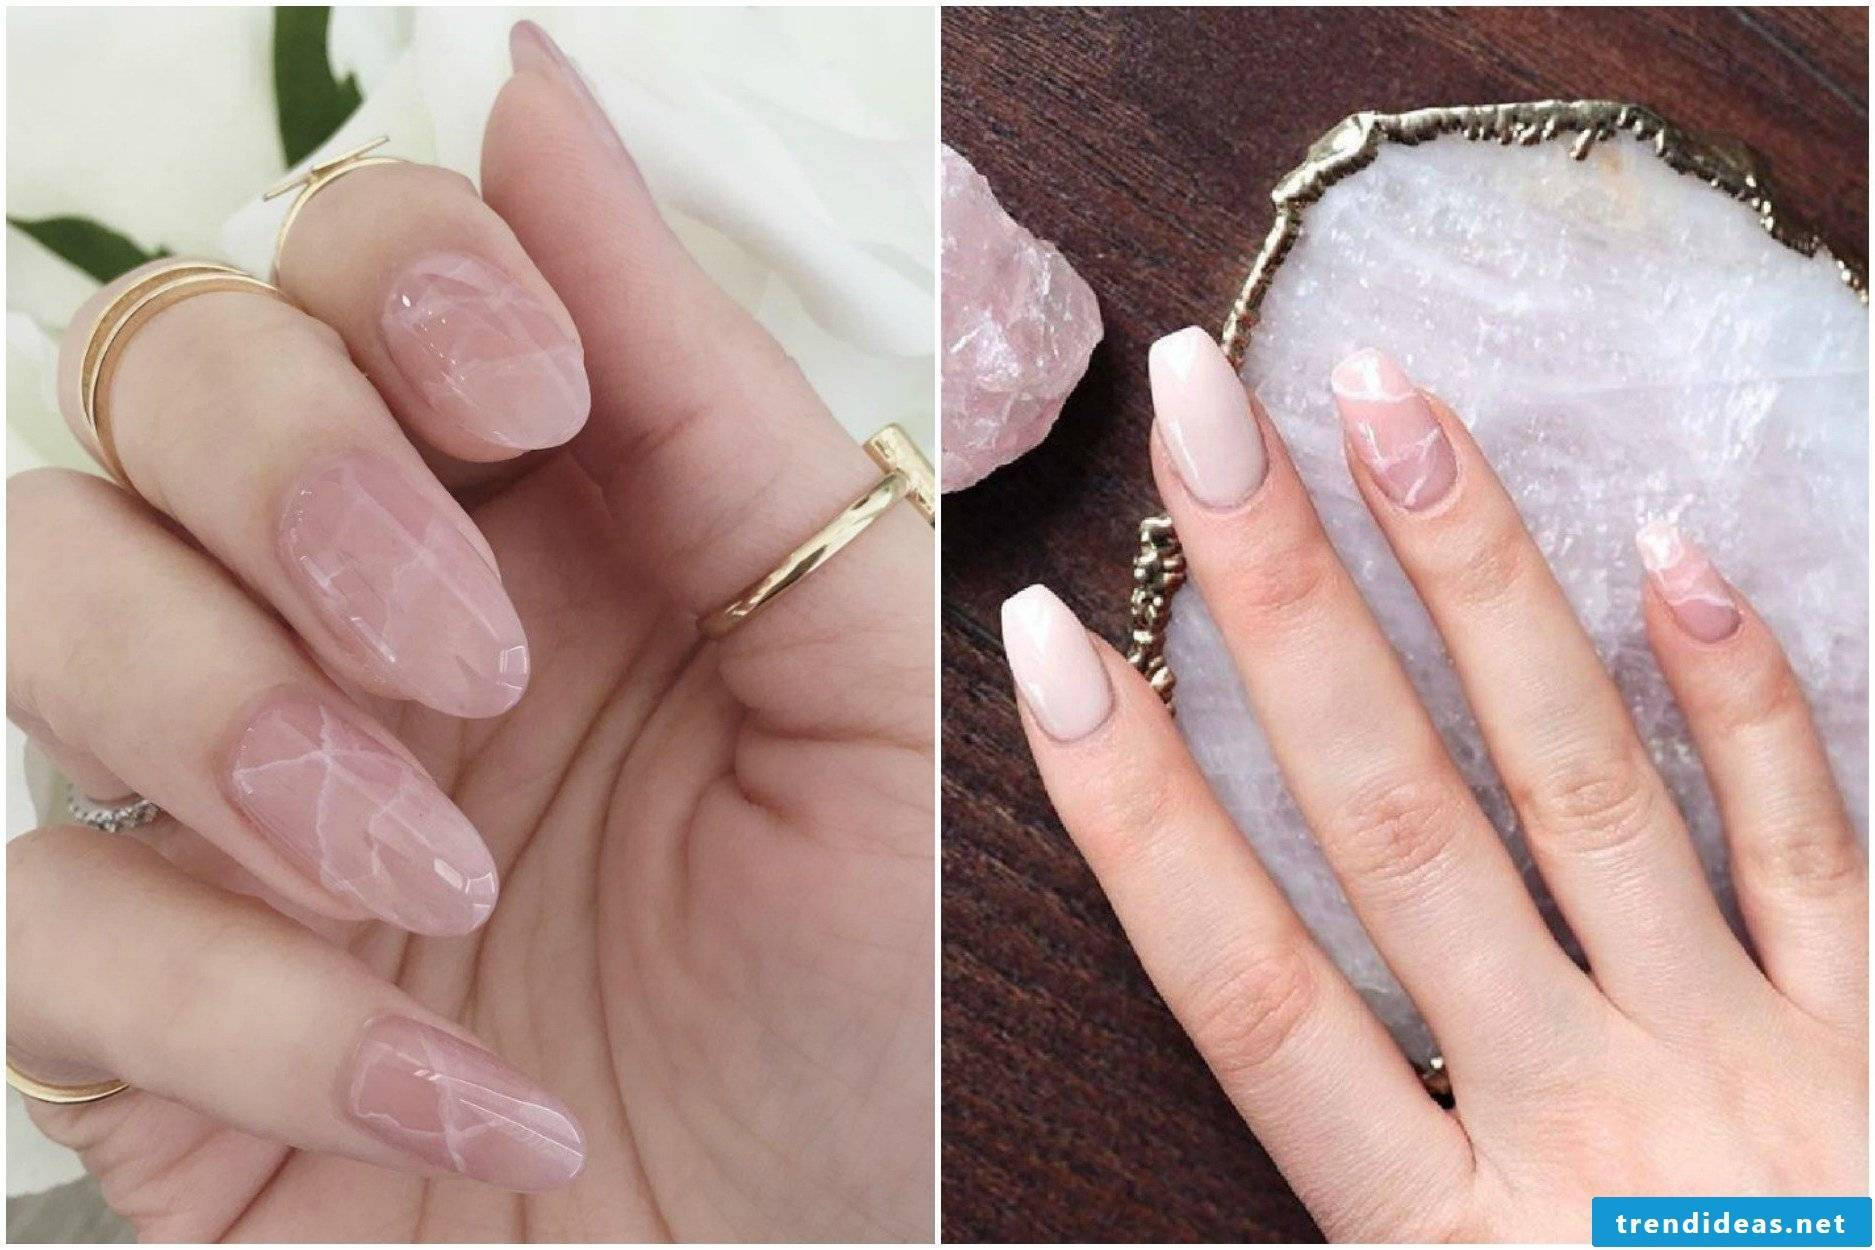 Nail motives Trends 2017